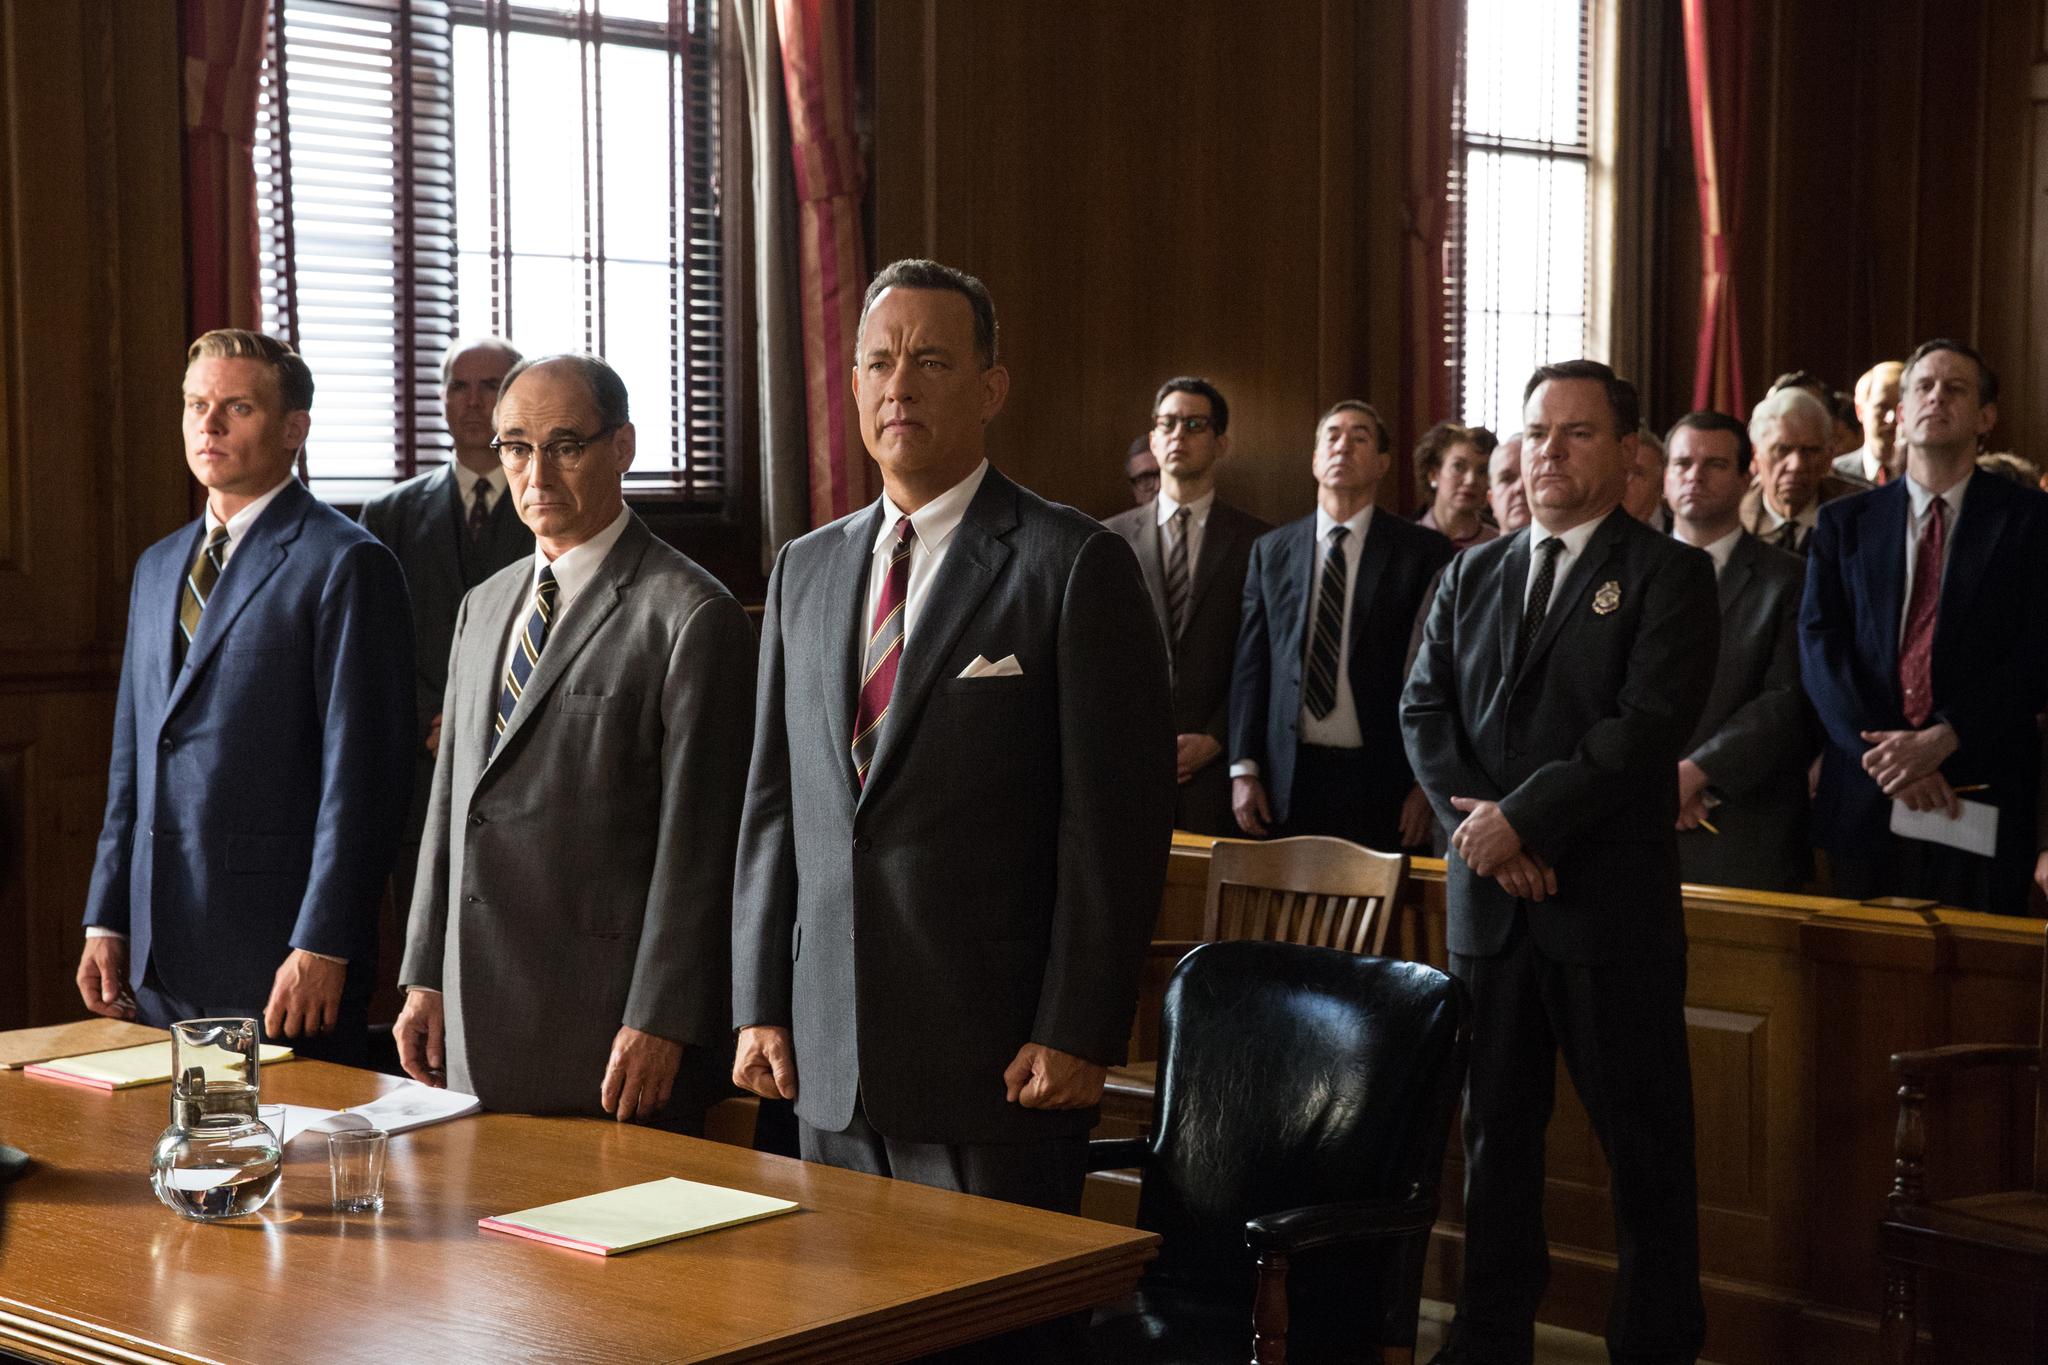 Tom Hanks, Mark Rylance, and Billy Magnussen in Bridge of Spies (2015)